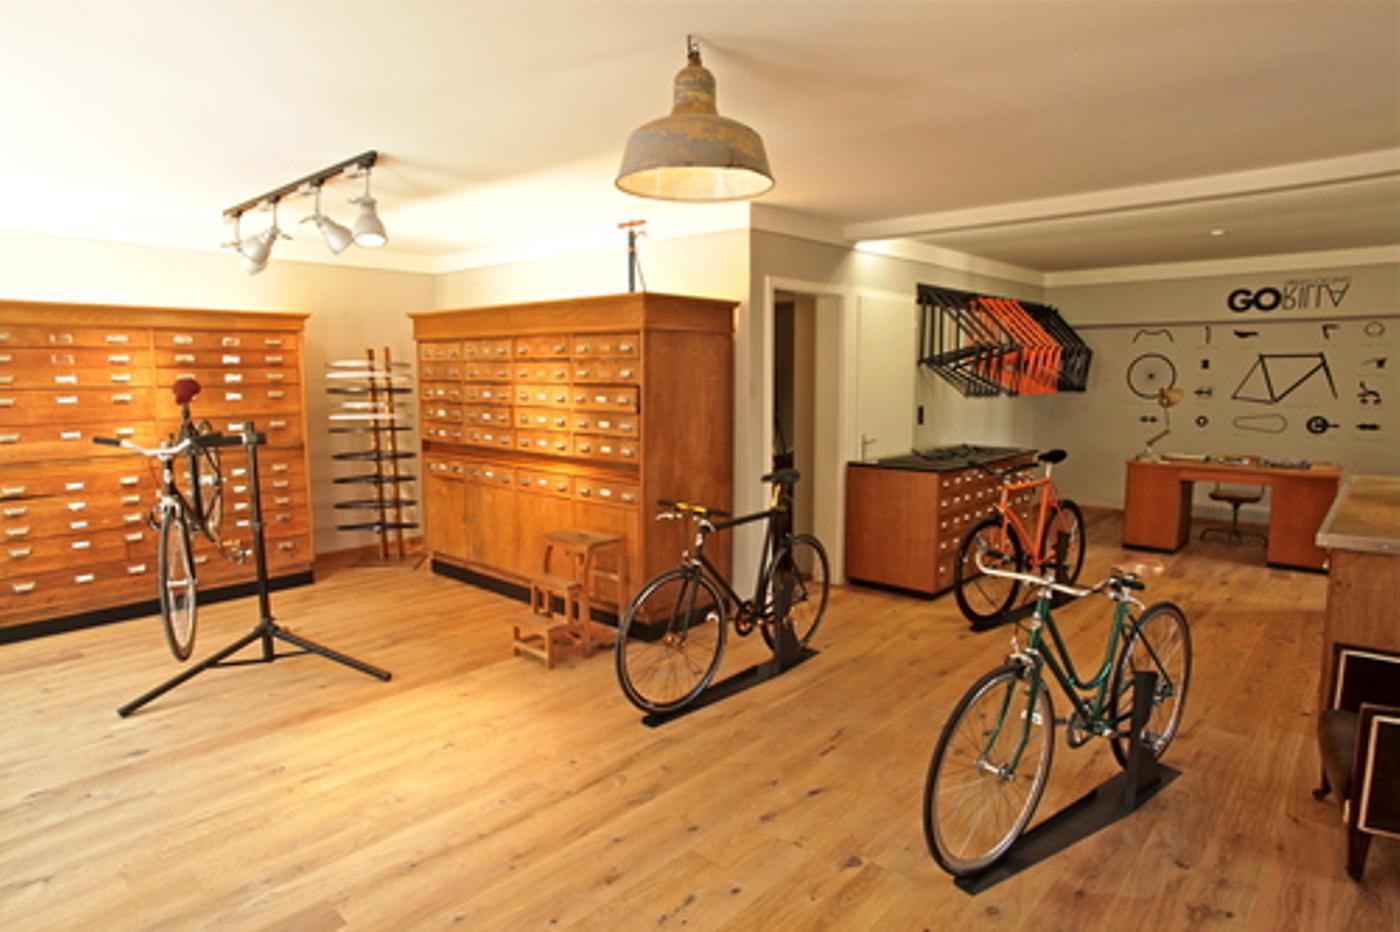 GOrilla-.-urban-cycling.jpg